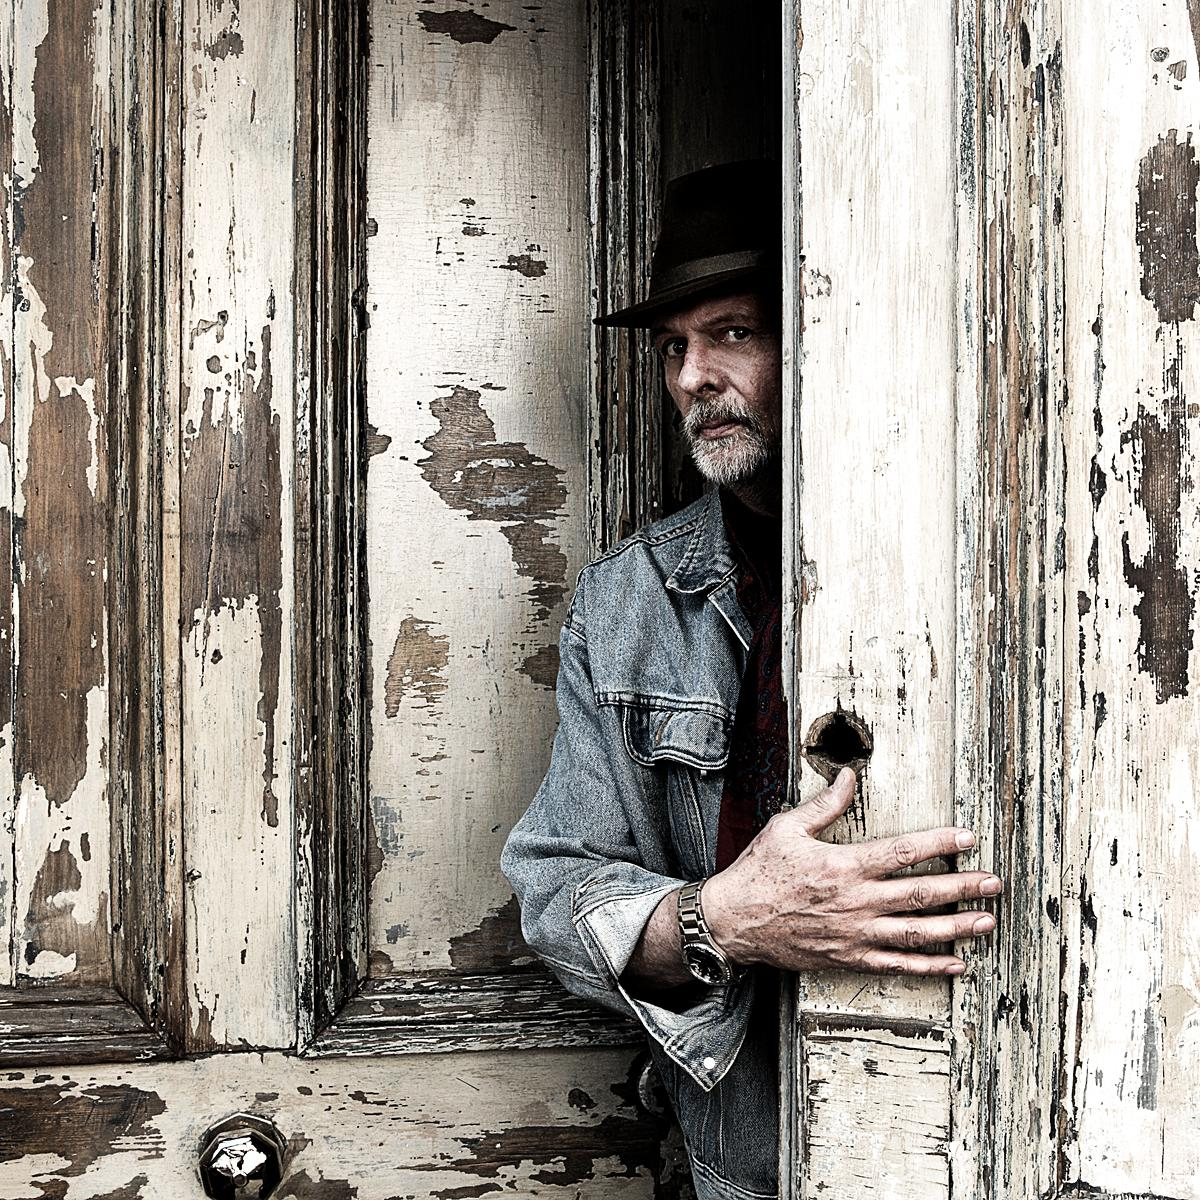 Portrait of Photographer Barney Edwards by Creative Photographer Julian Hanford